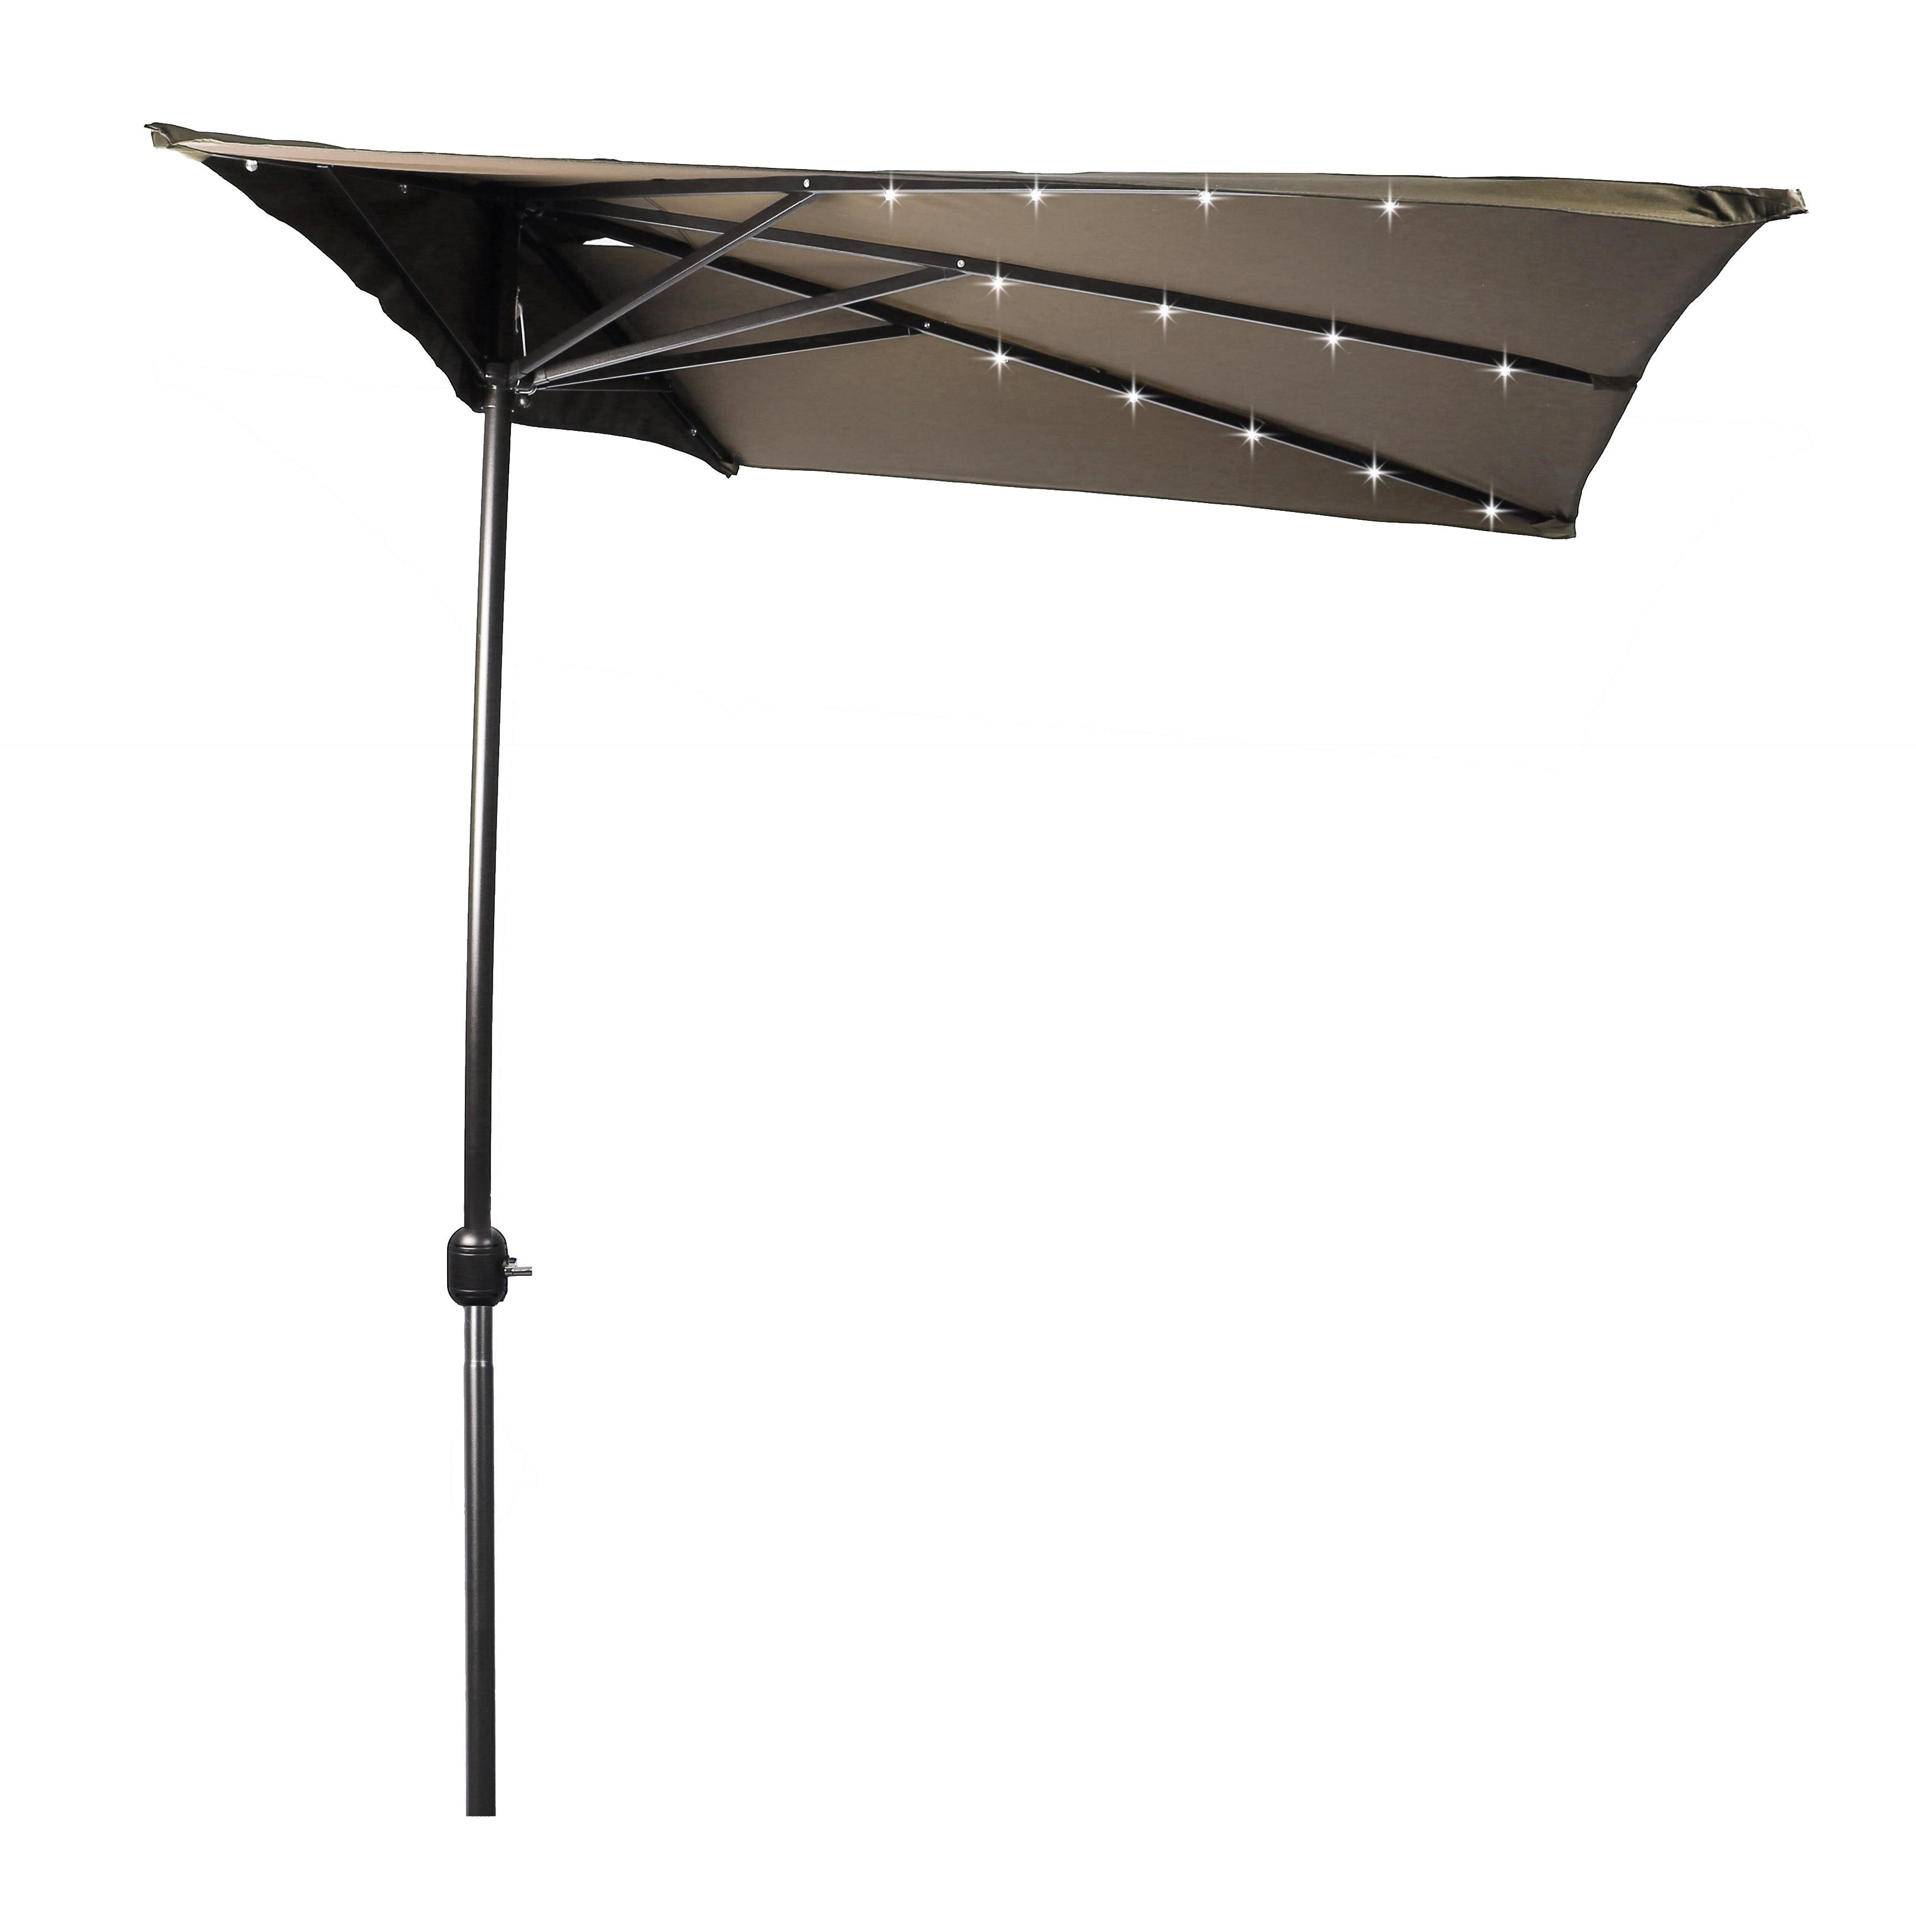 Monty Market Umbrellas Inside 2019 Brazelton 6.5' Lighted Half Umbrella (Gallery 15 of 20)